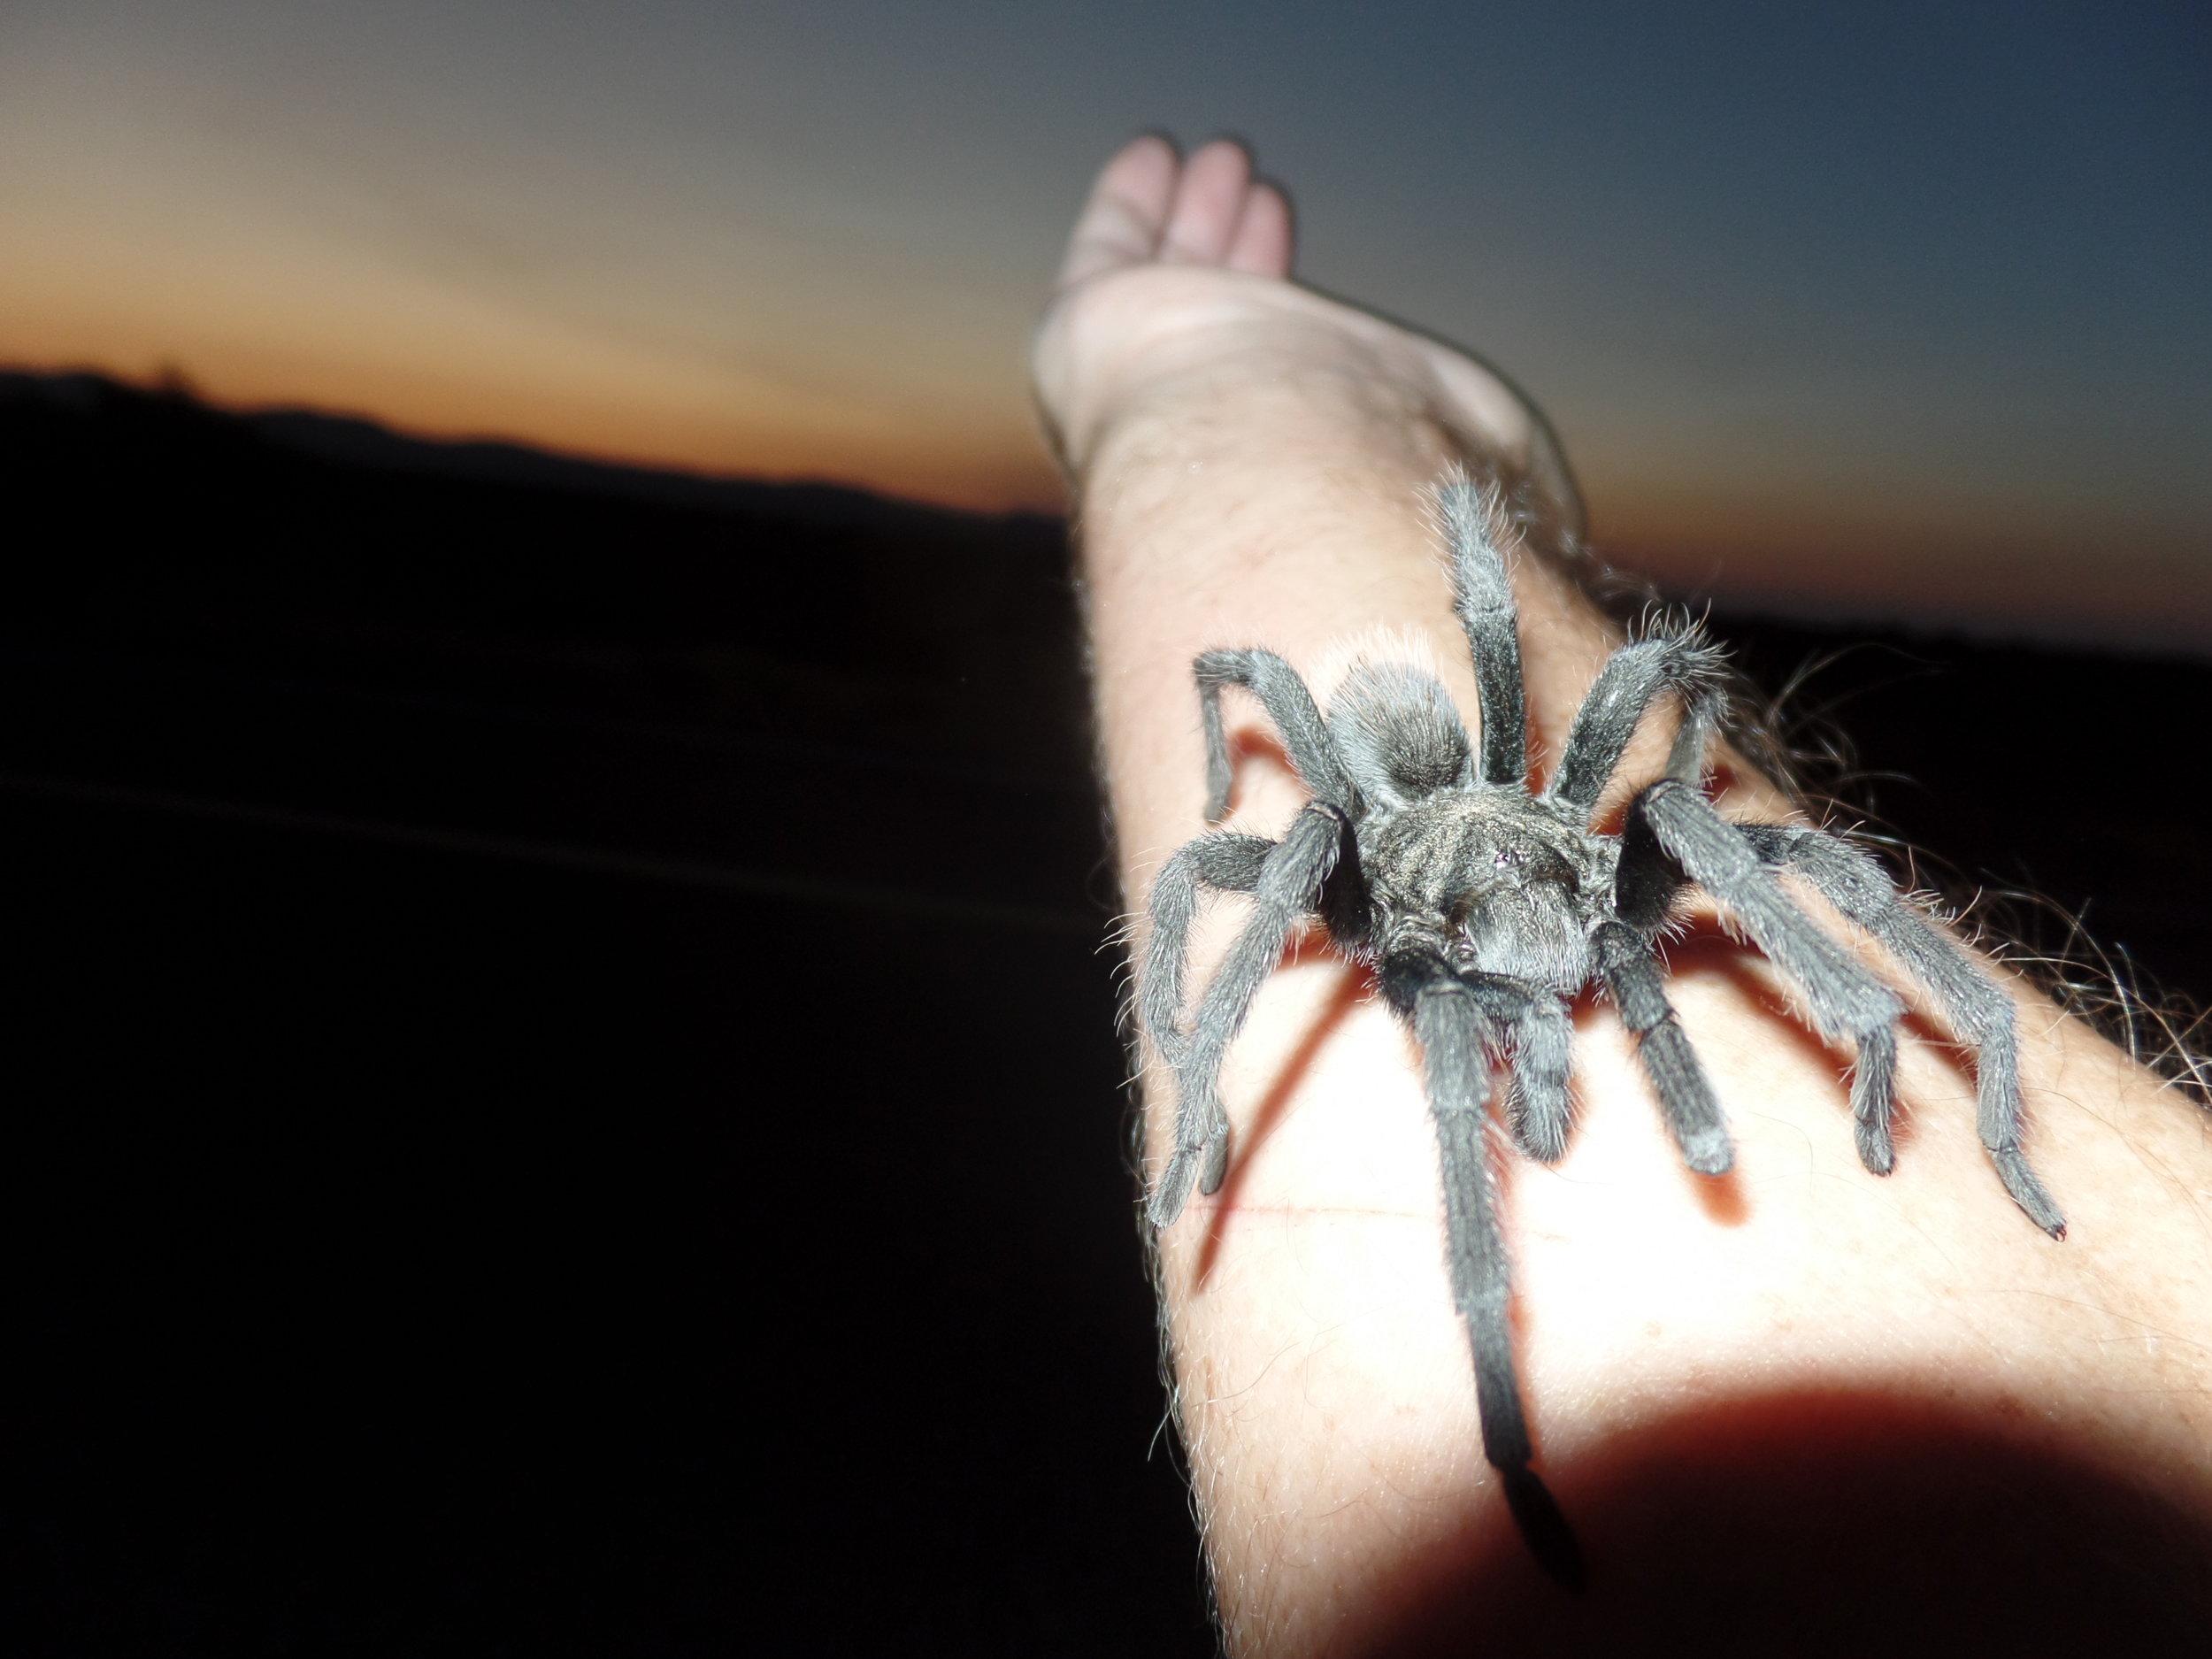 Tarantula - Seen on my run - Catalina, Arizona